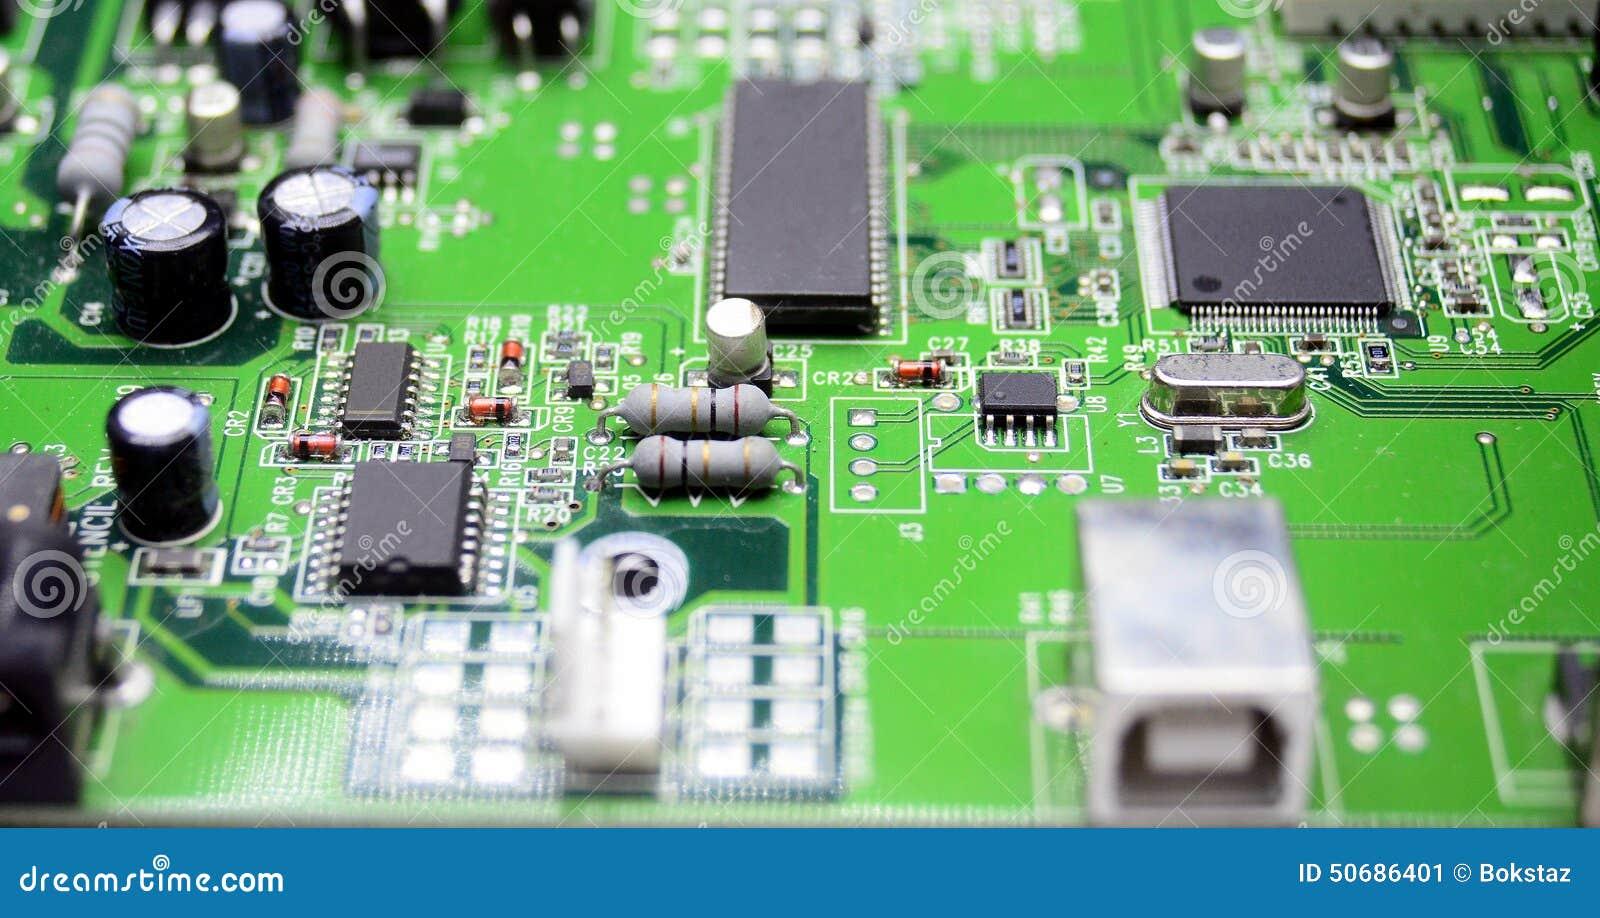 Download 有无线电零件的电路板 库存图片. 图片 包括有 工程, 数据, 电路, 集成, 详细资料, 电阻器, 信息 - 50686401